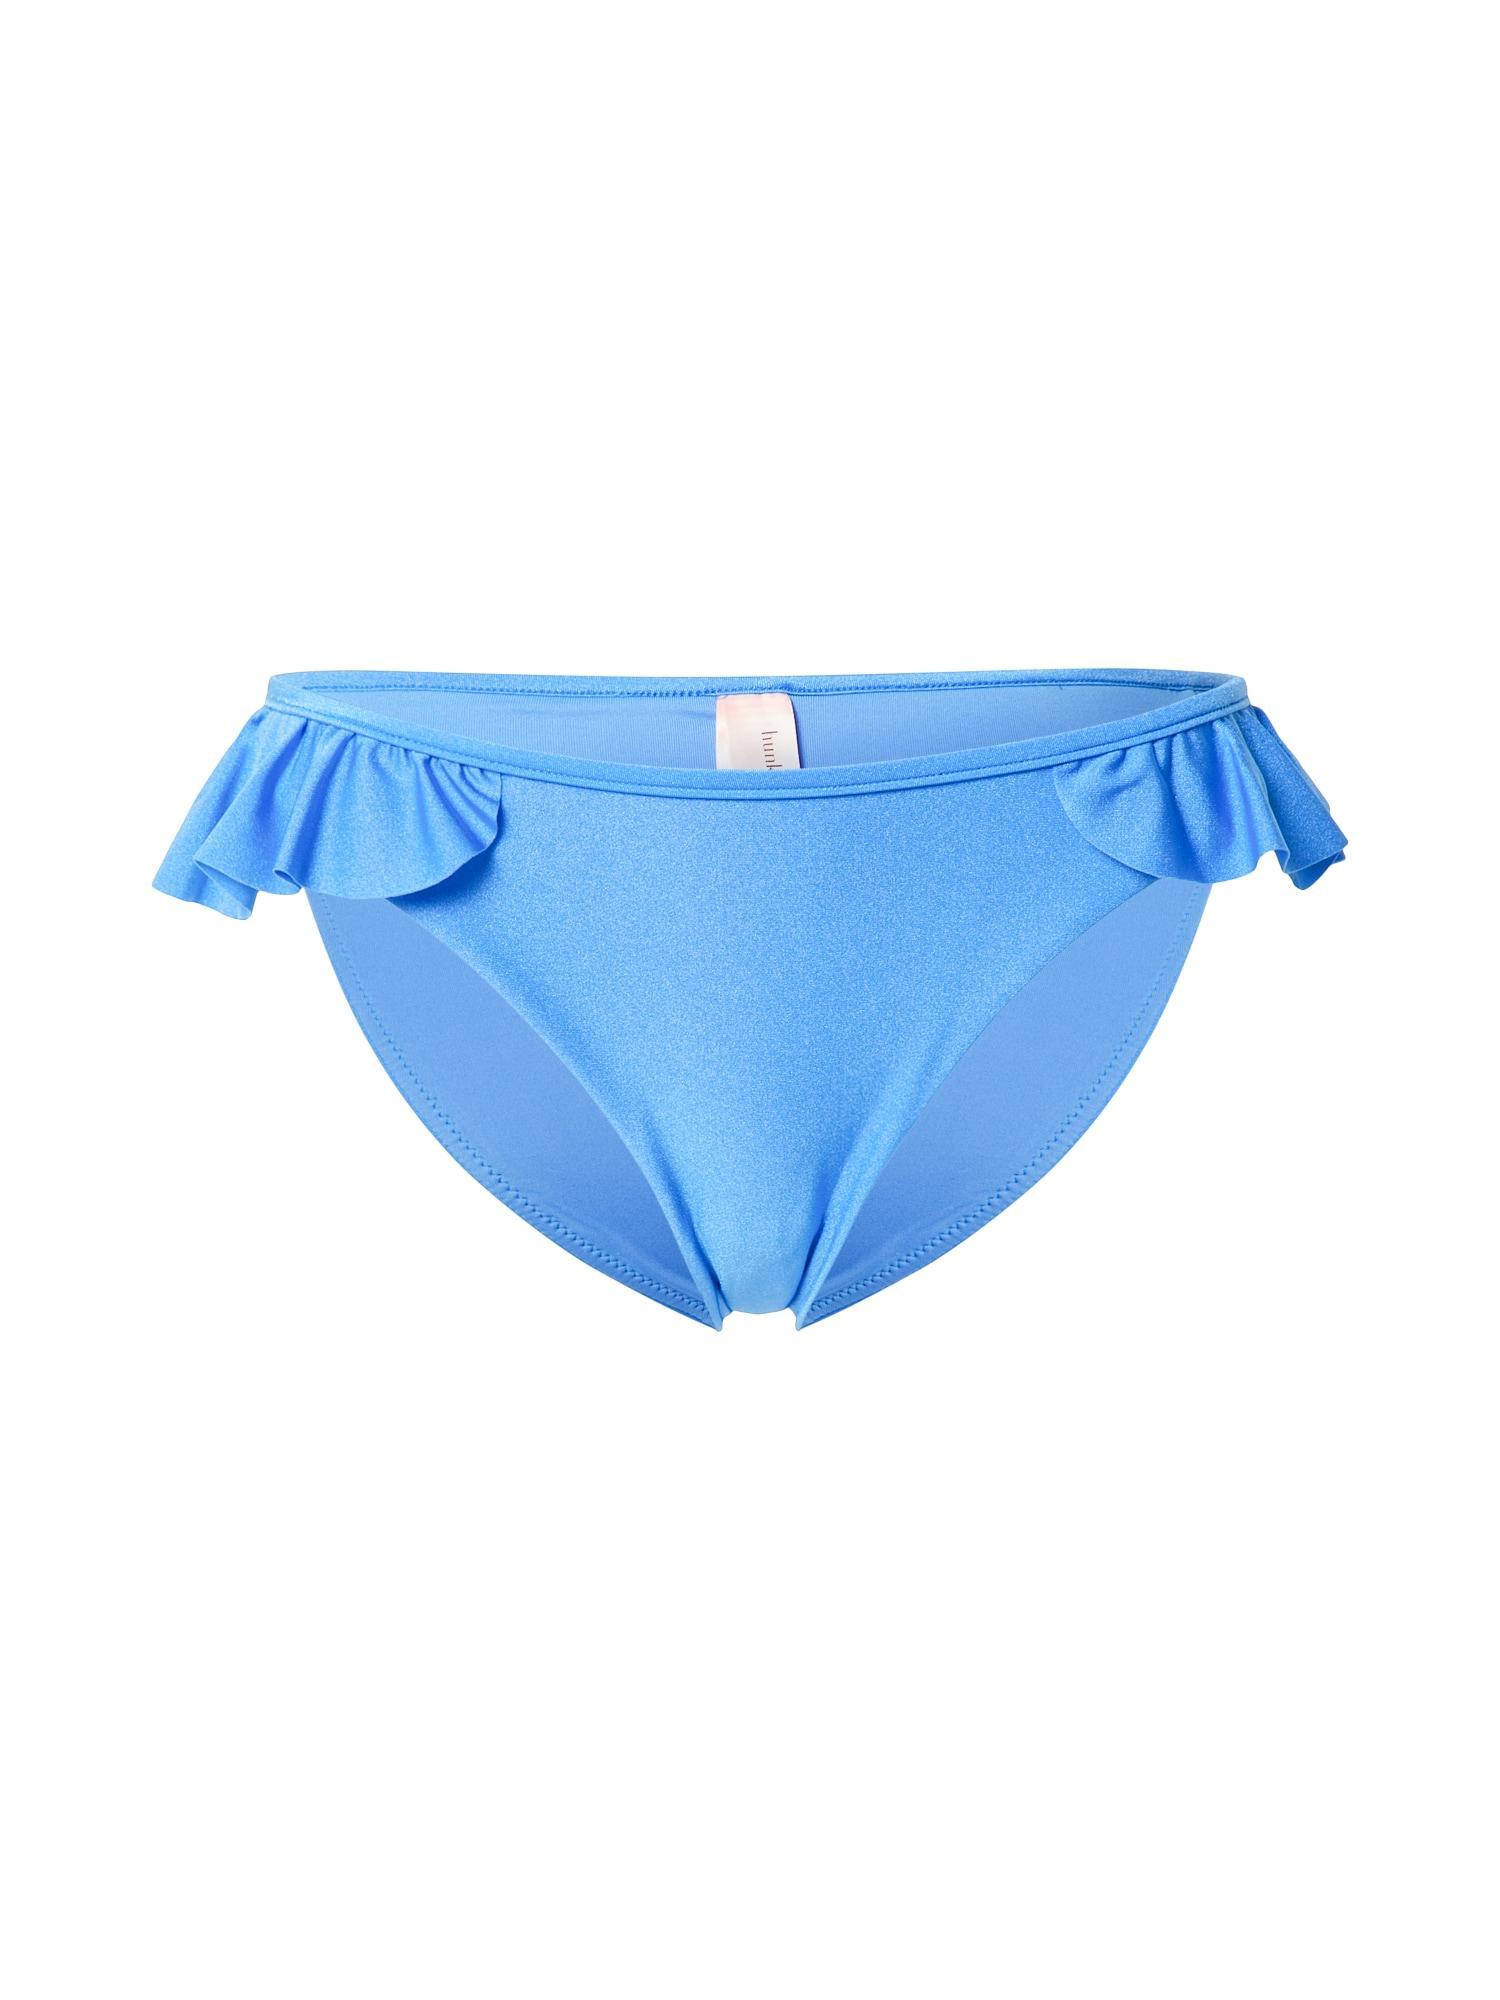 Hunkemöller Bikinio kelnaitės